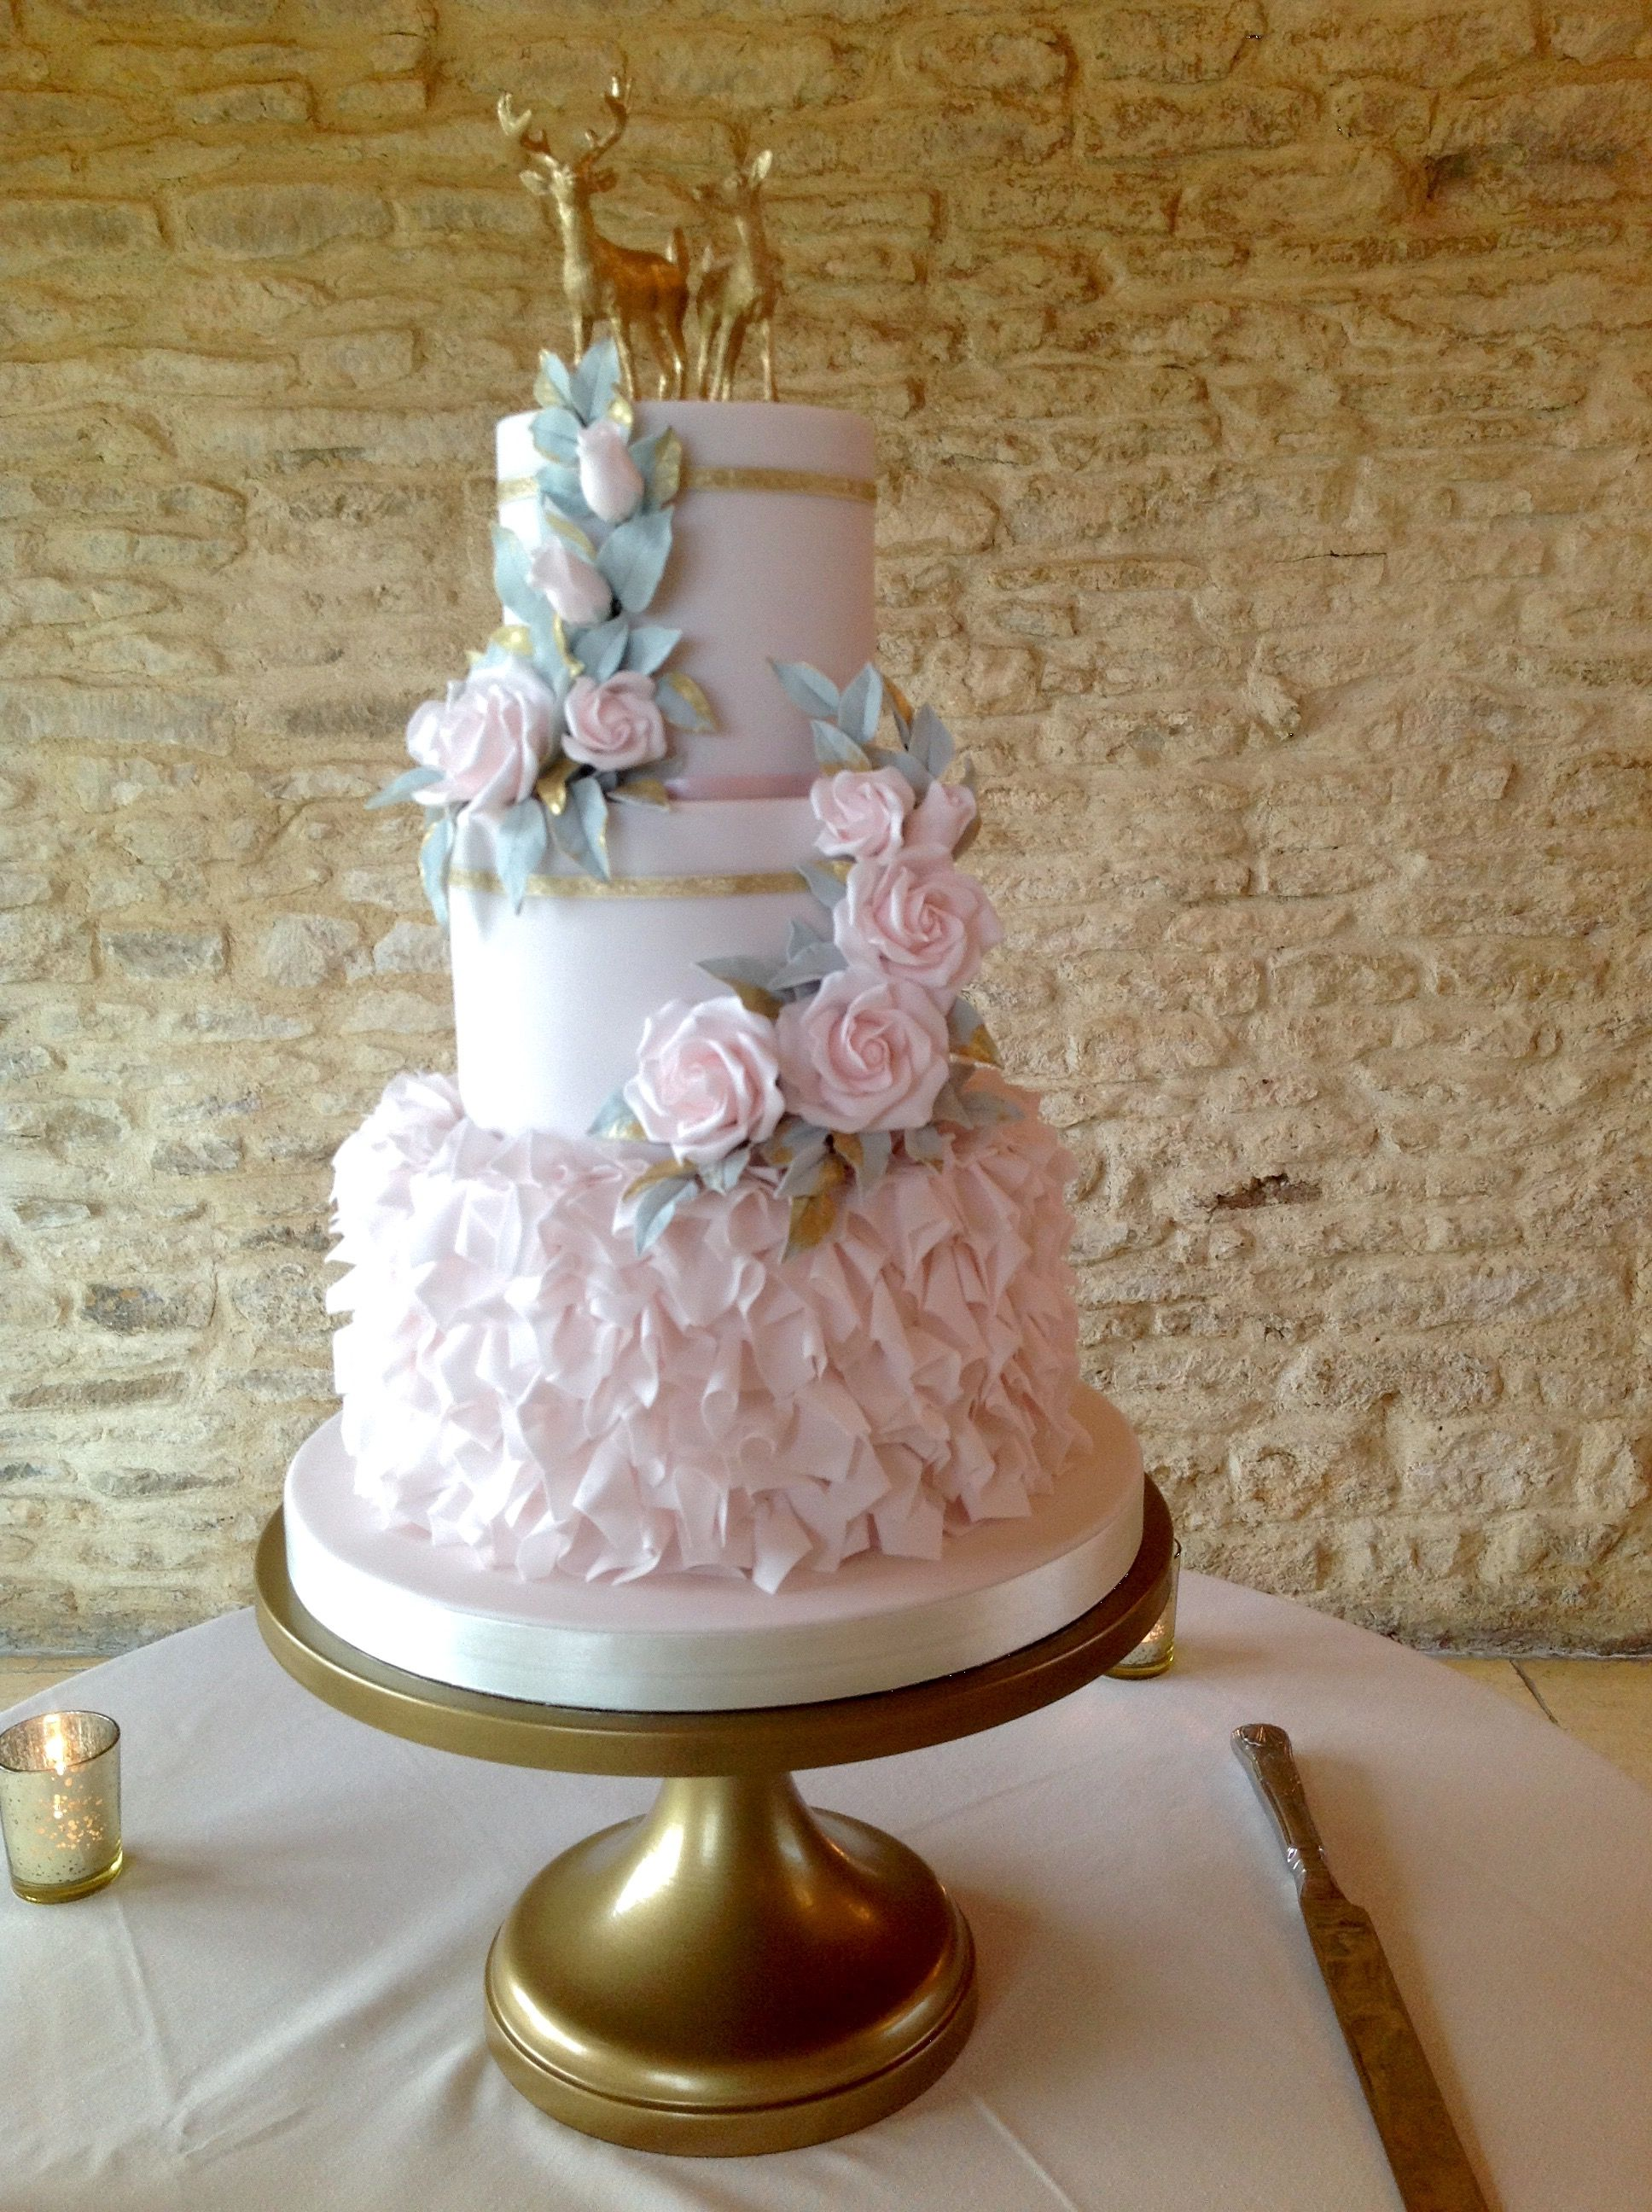 Amazing Wedding Cakes Cake Art Beautiful Bakeries Groom Baking